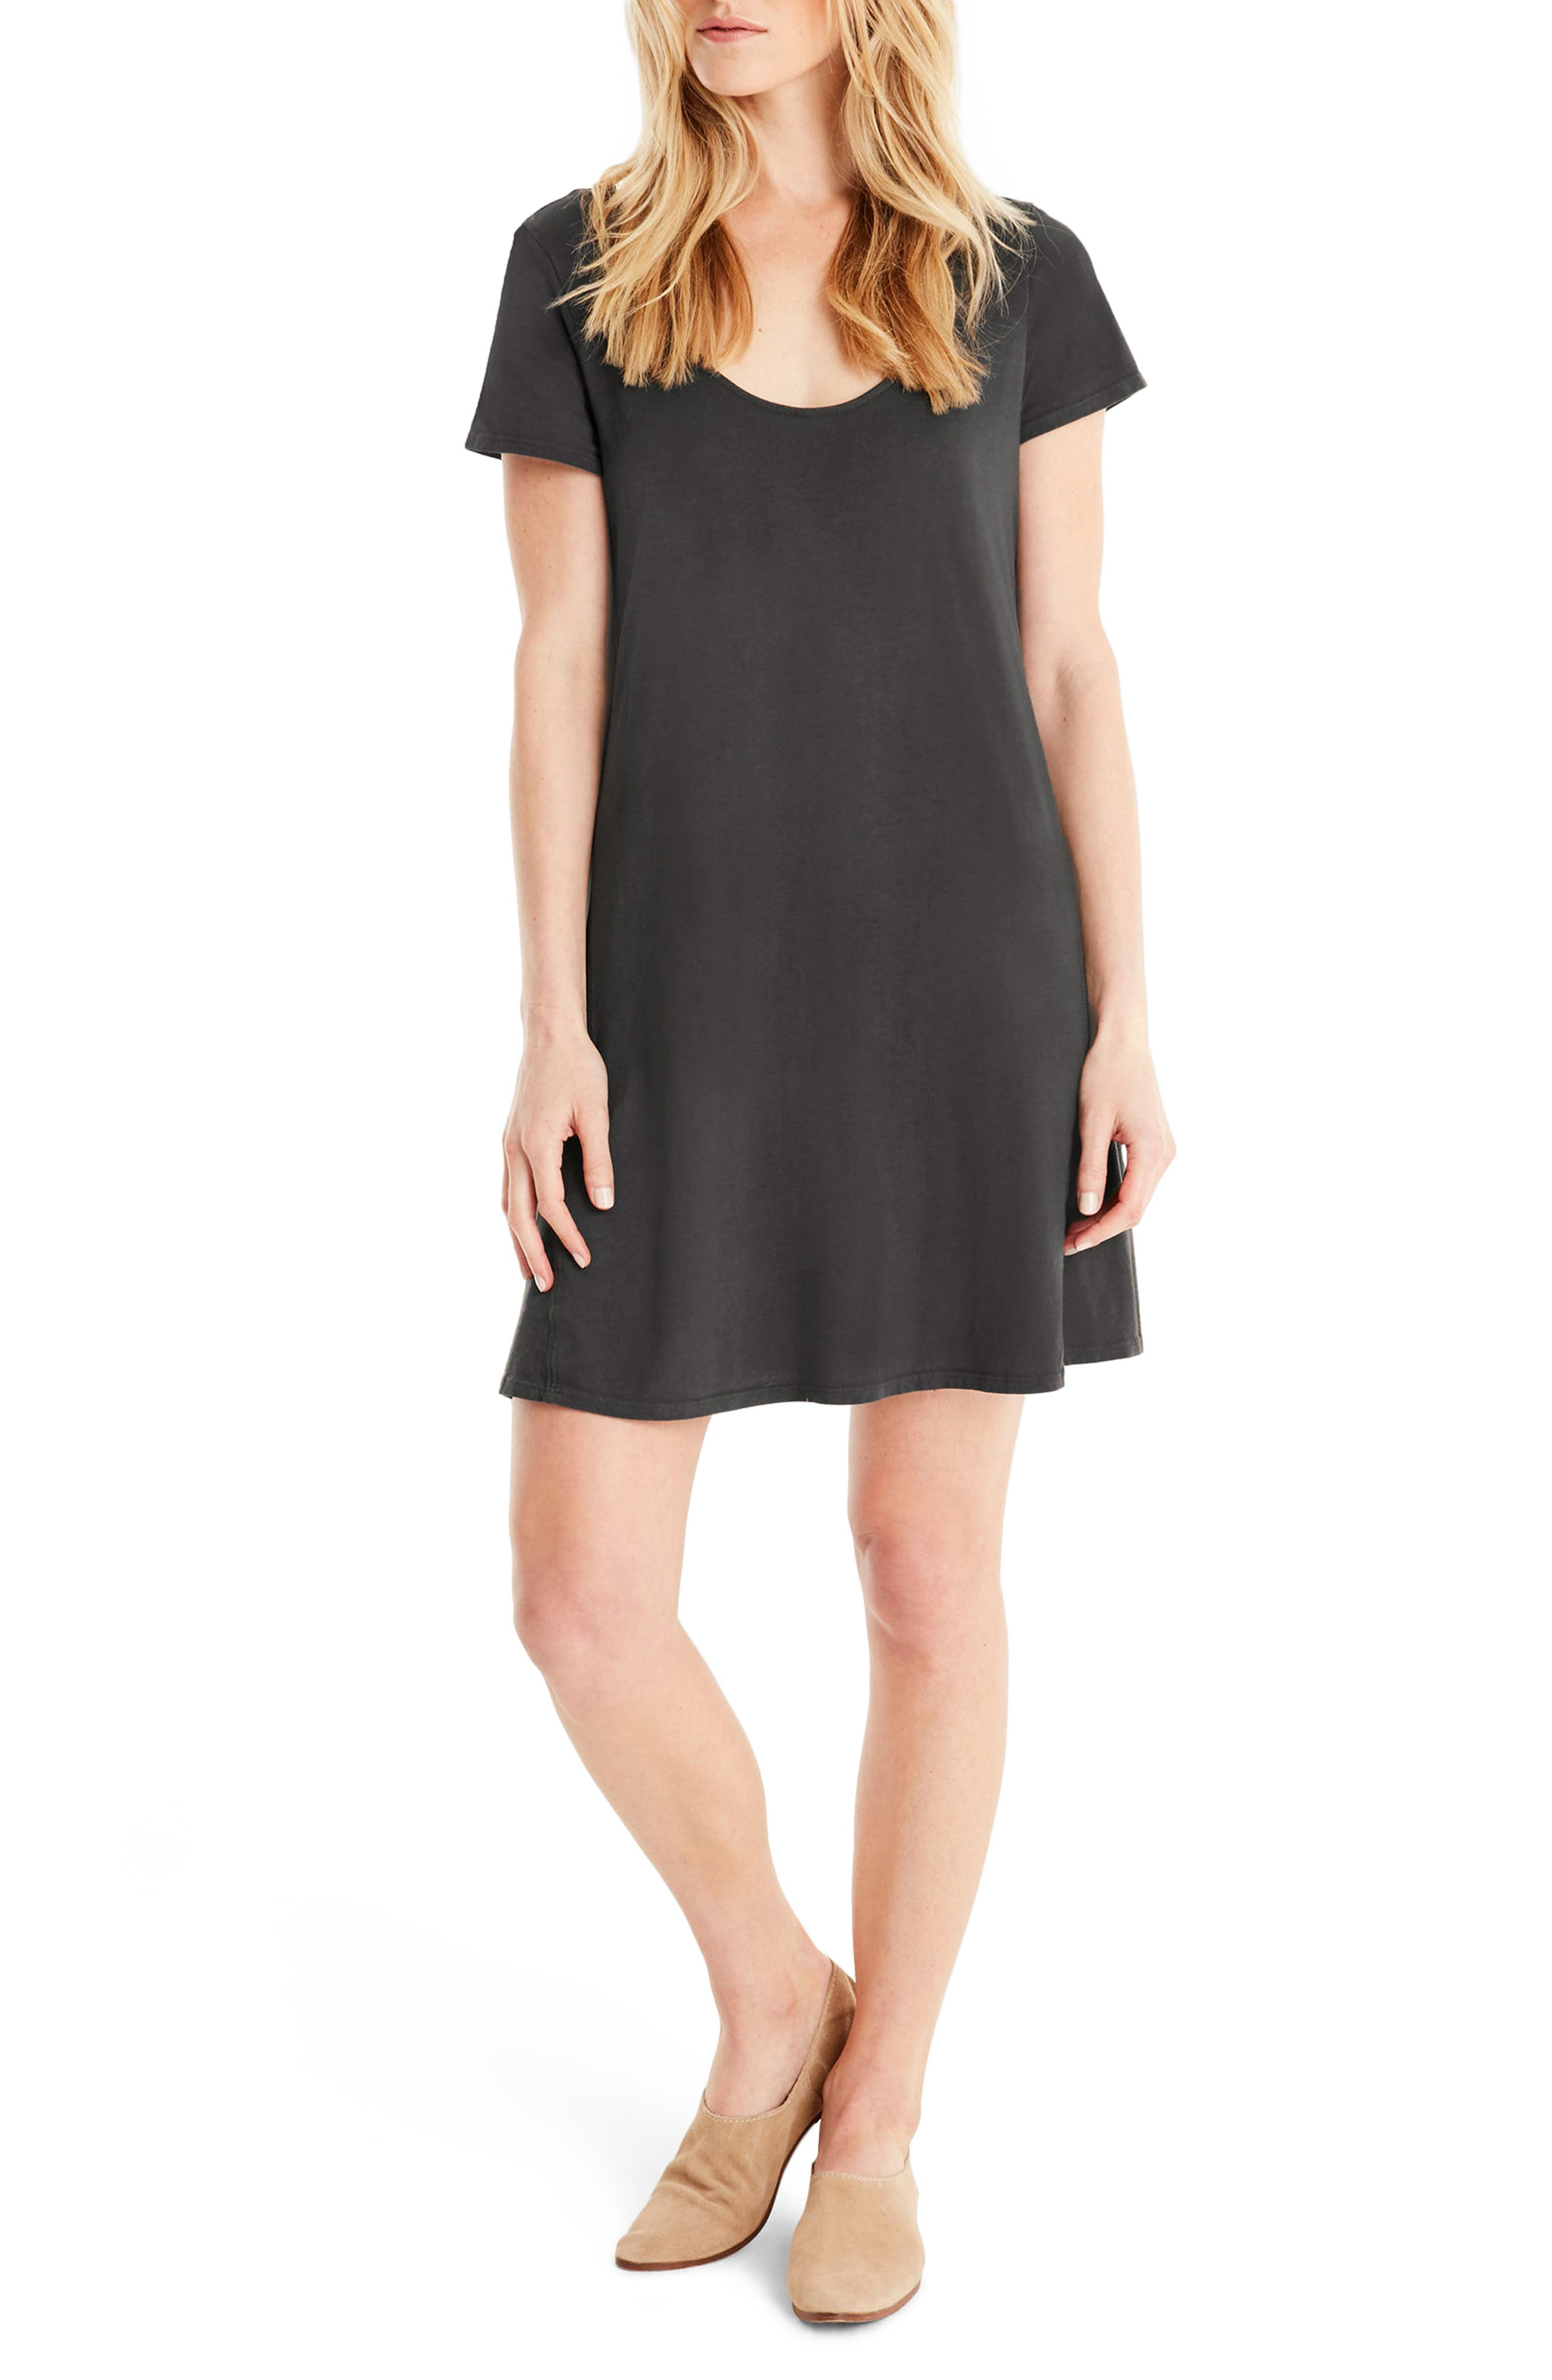 MICHAEL STARS A-Line Dress